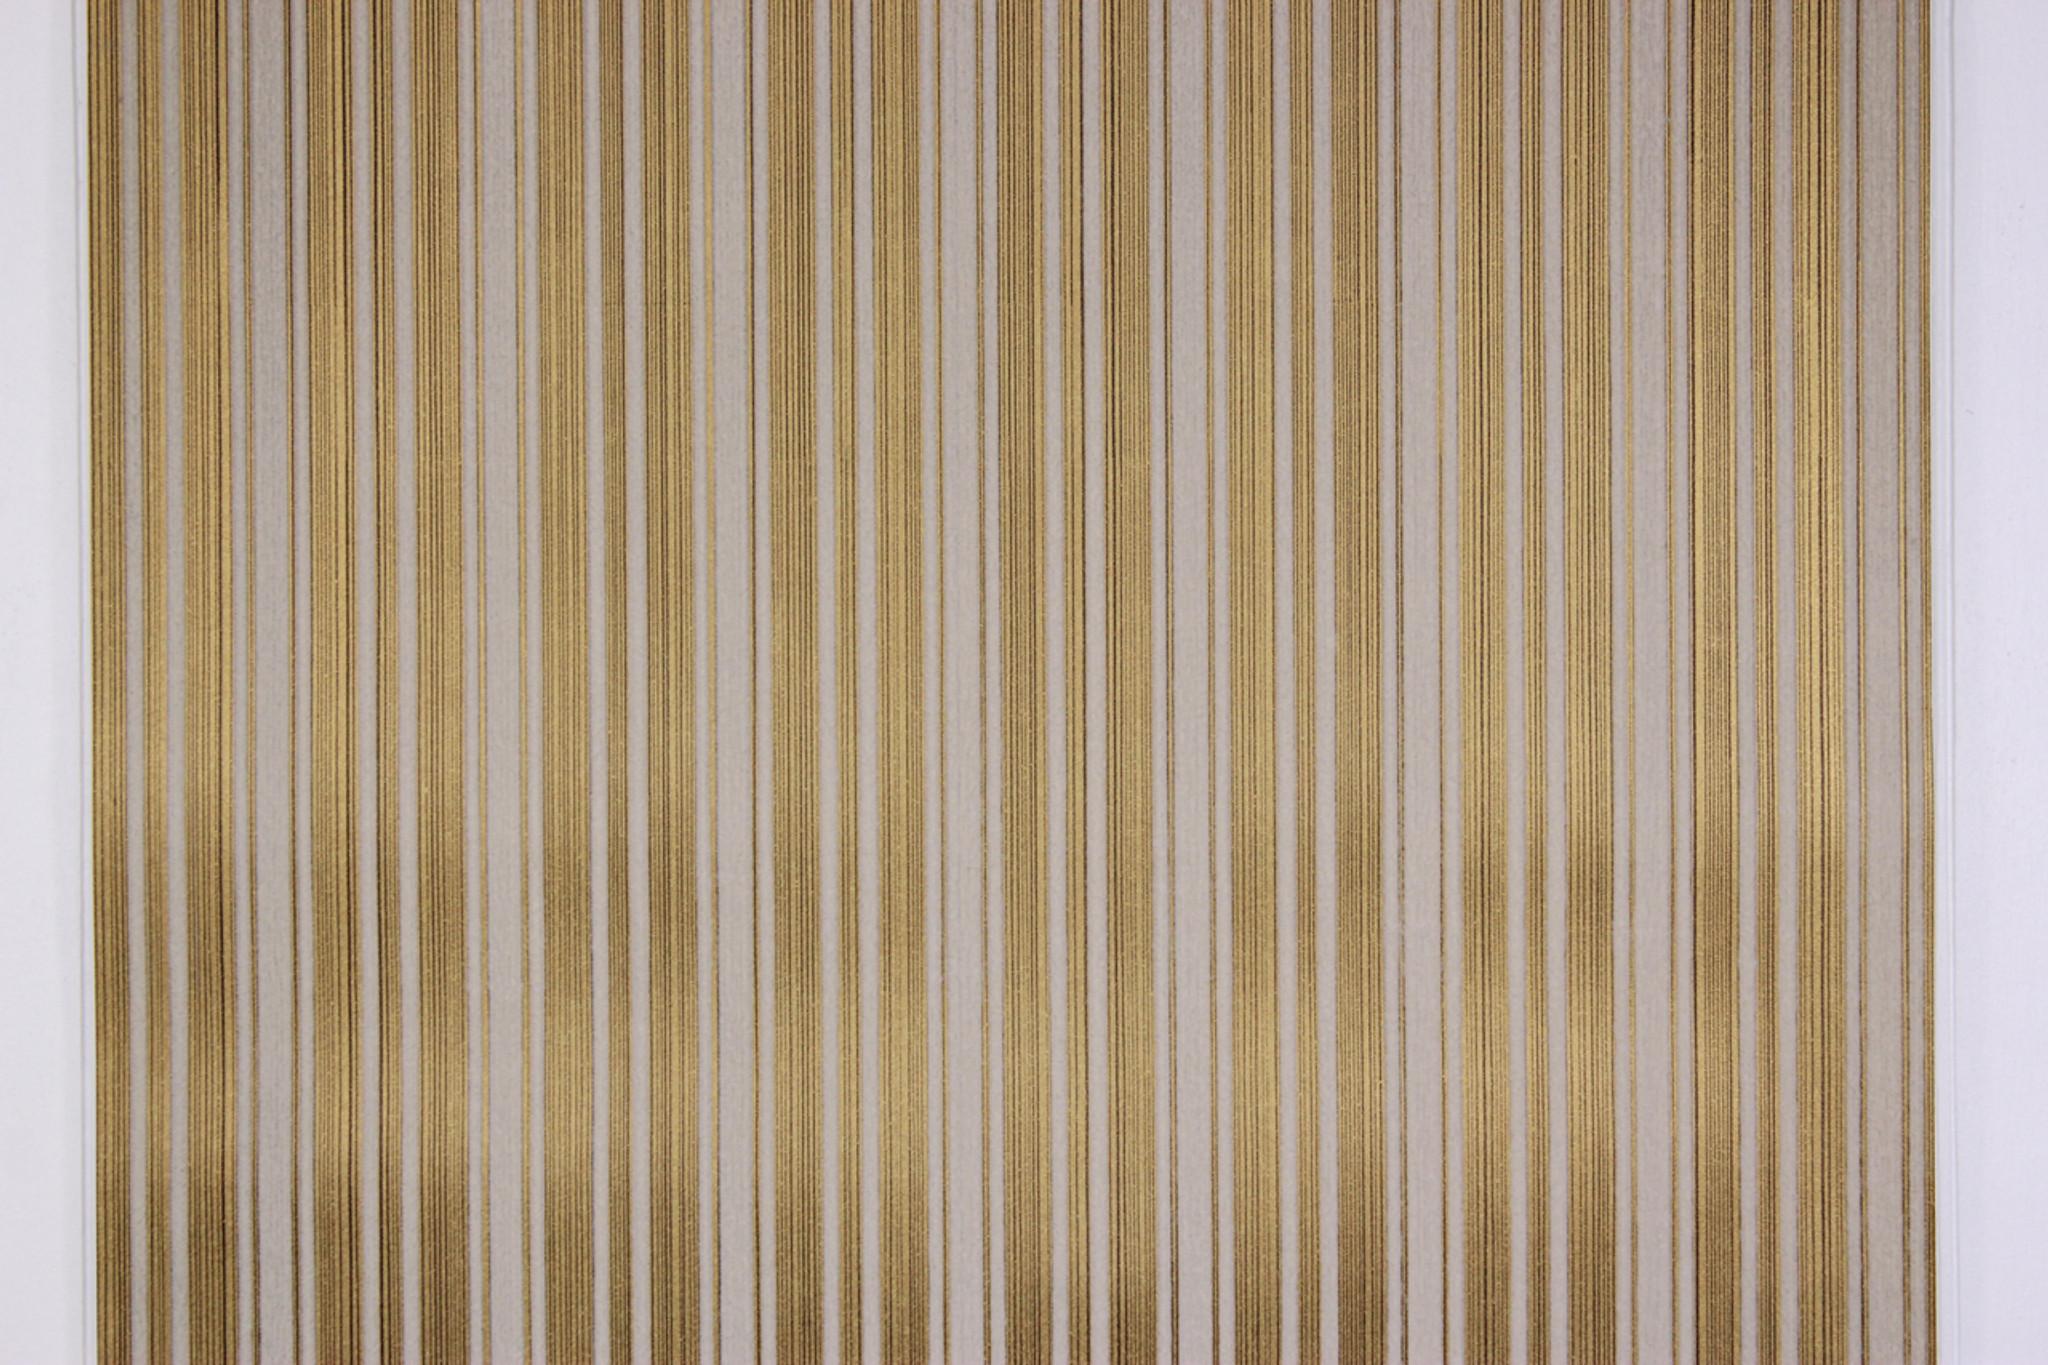 3329c2d44a6 1970s Vintage Wallpaper White Flock Stripe on Gold Black Pinstripe ...